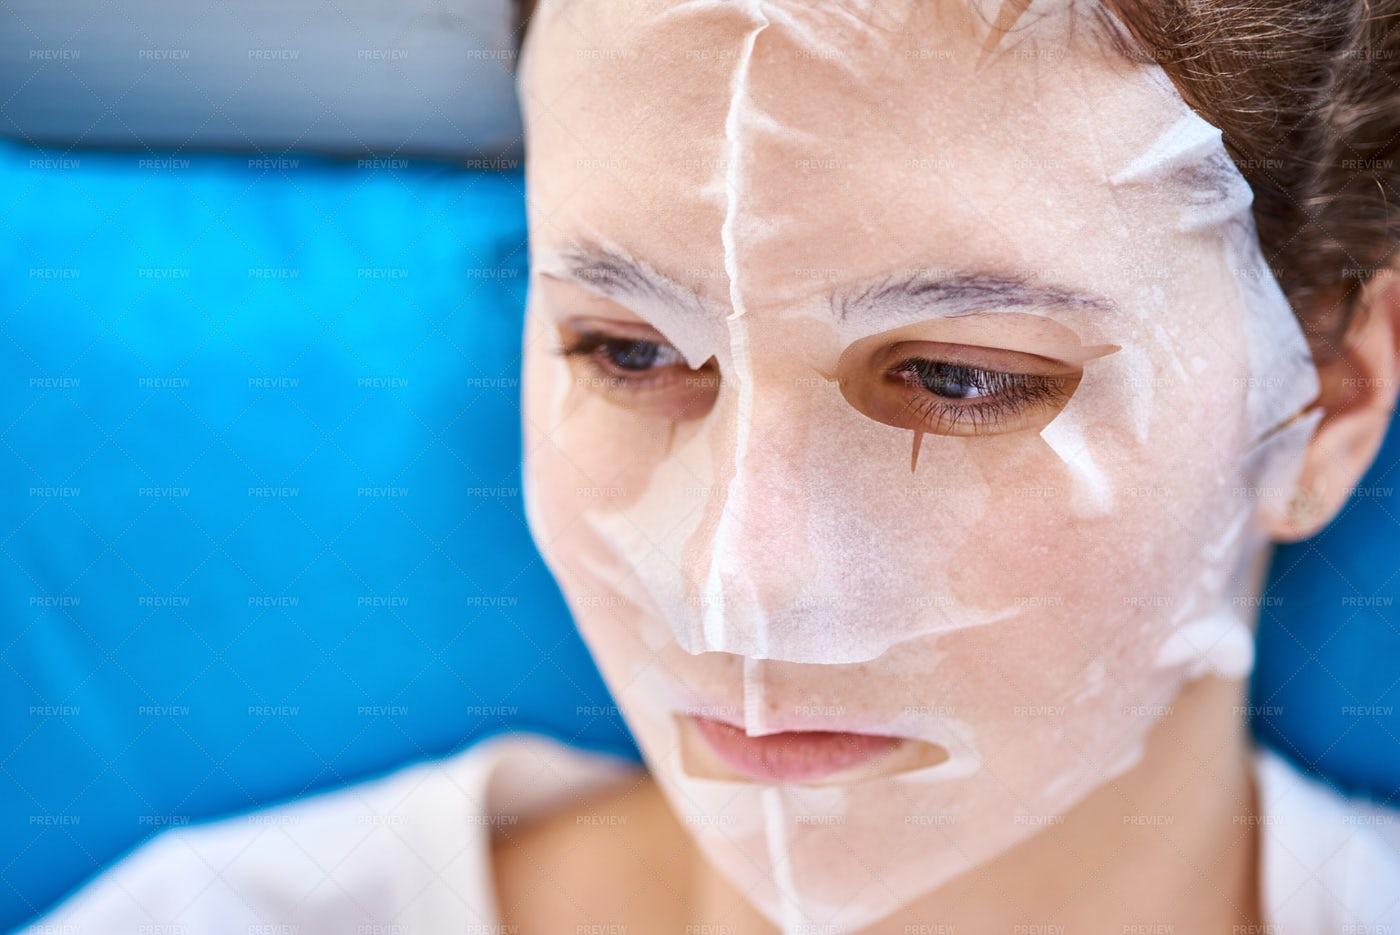 Woman In A Paper Facial Mask: Stock Photos